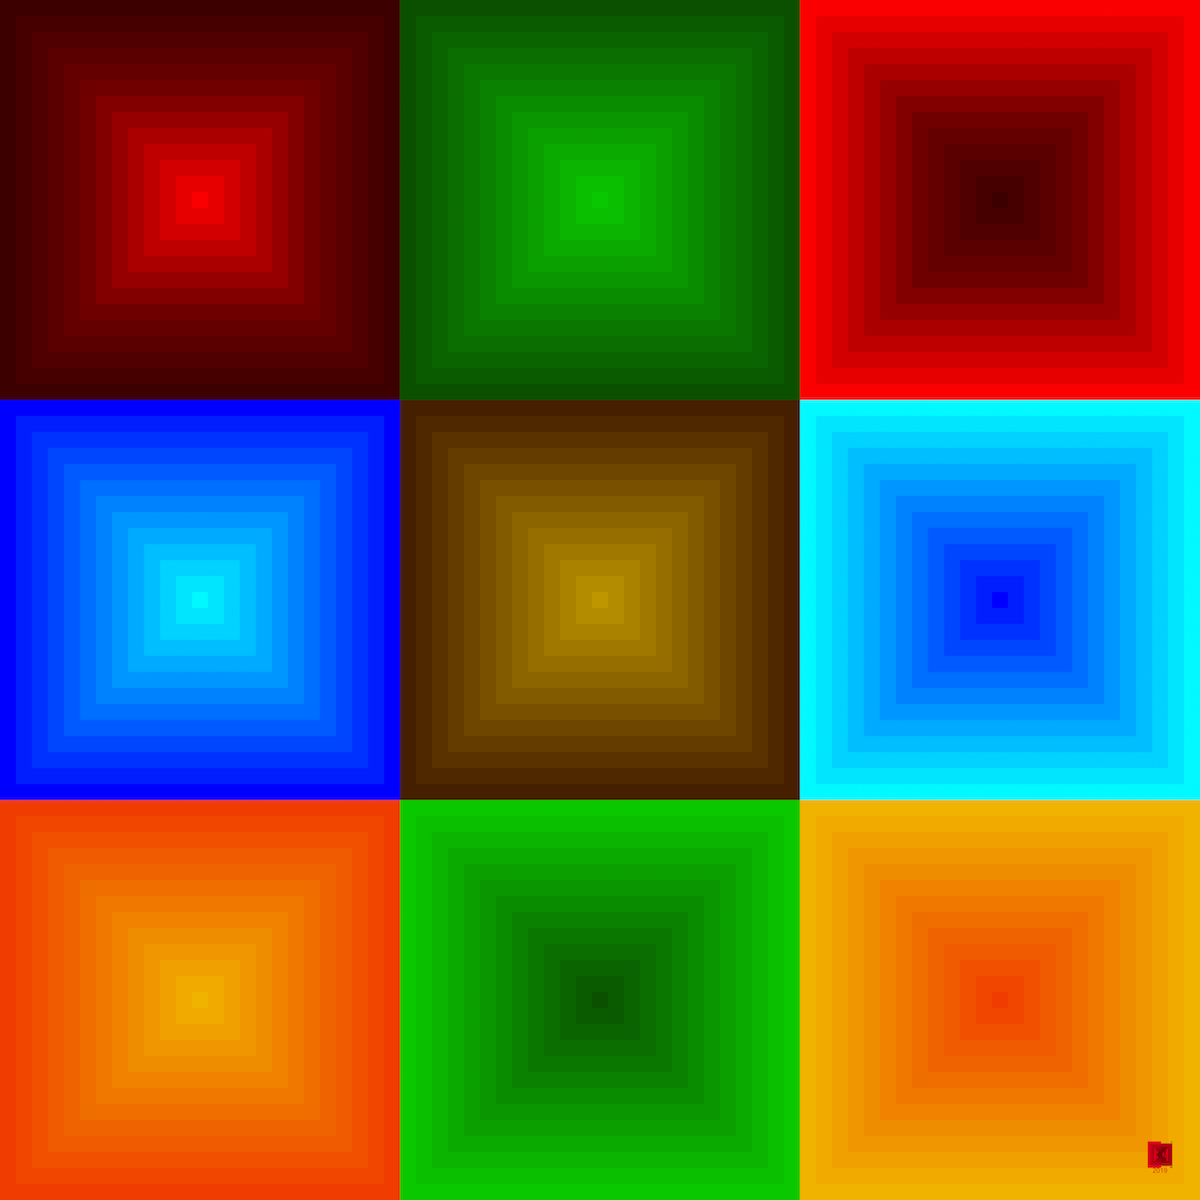 126 Punto di vista (900 x 900).jpg